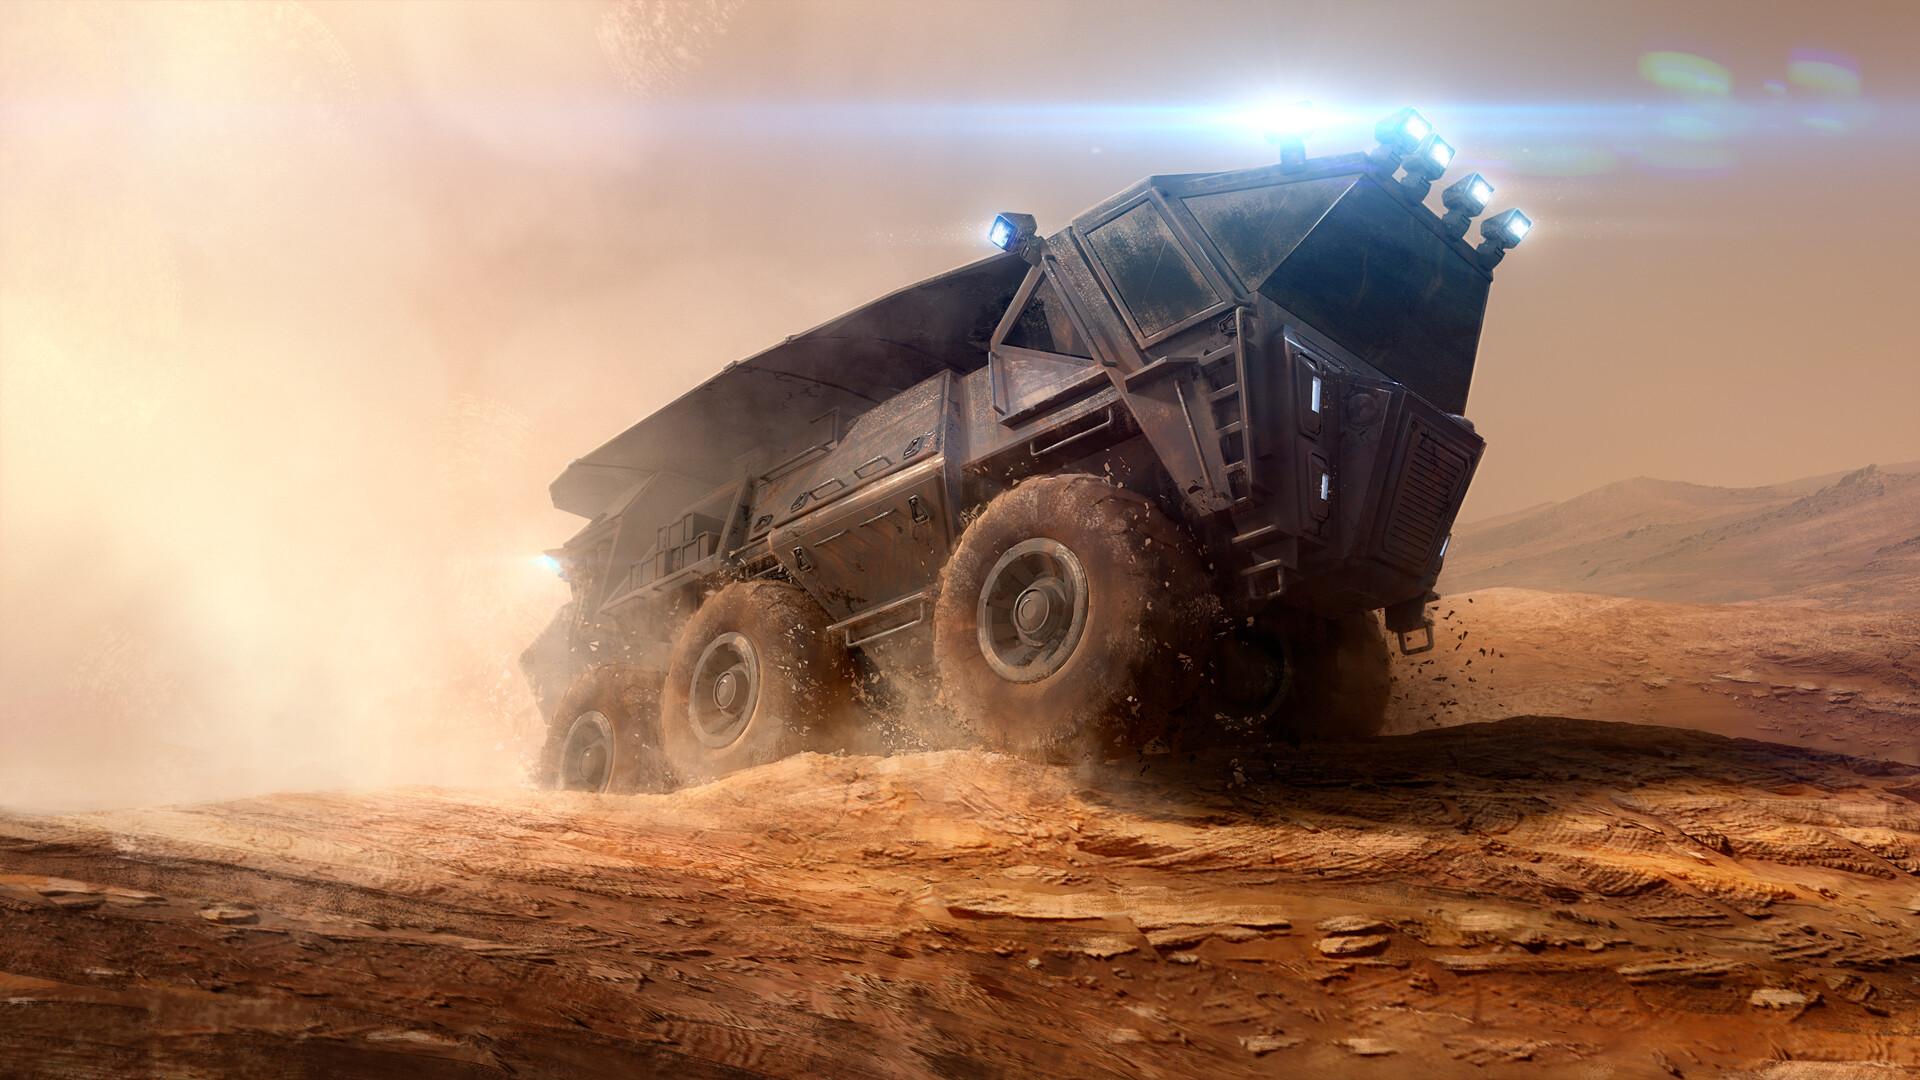 Wojtek kapusta conqueror mars vehicle main hd